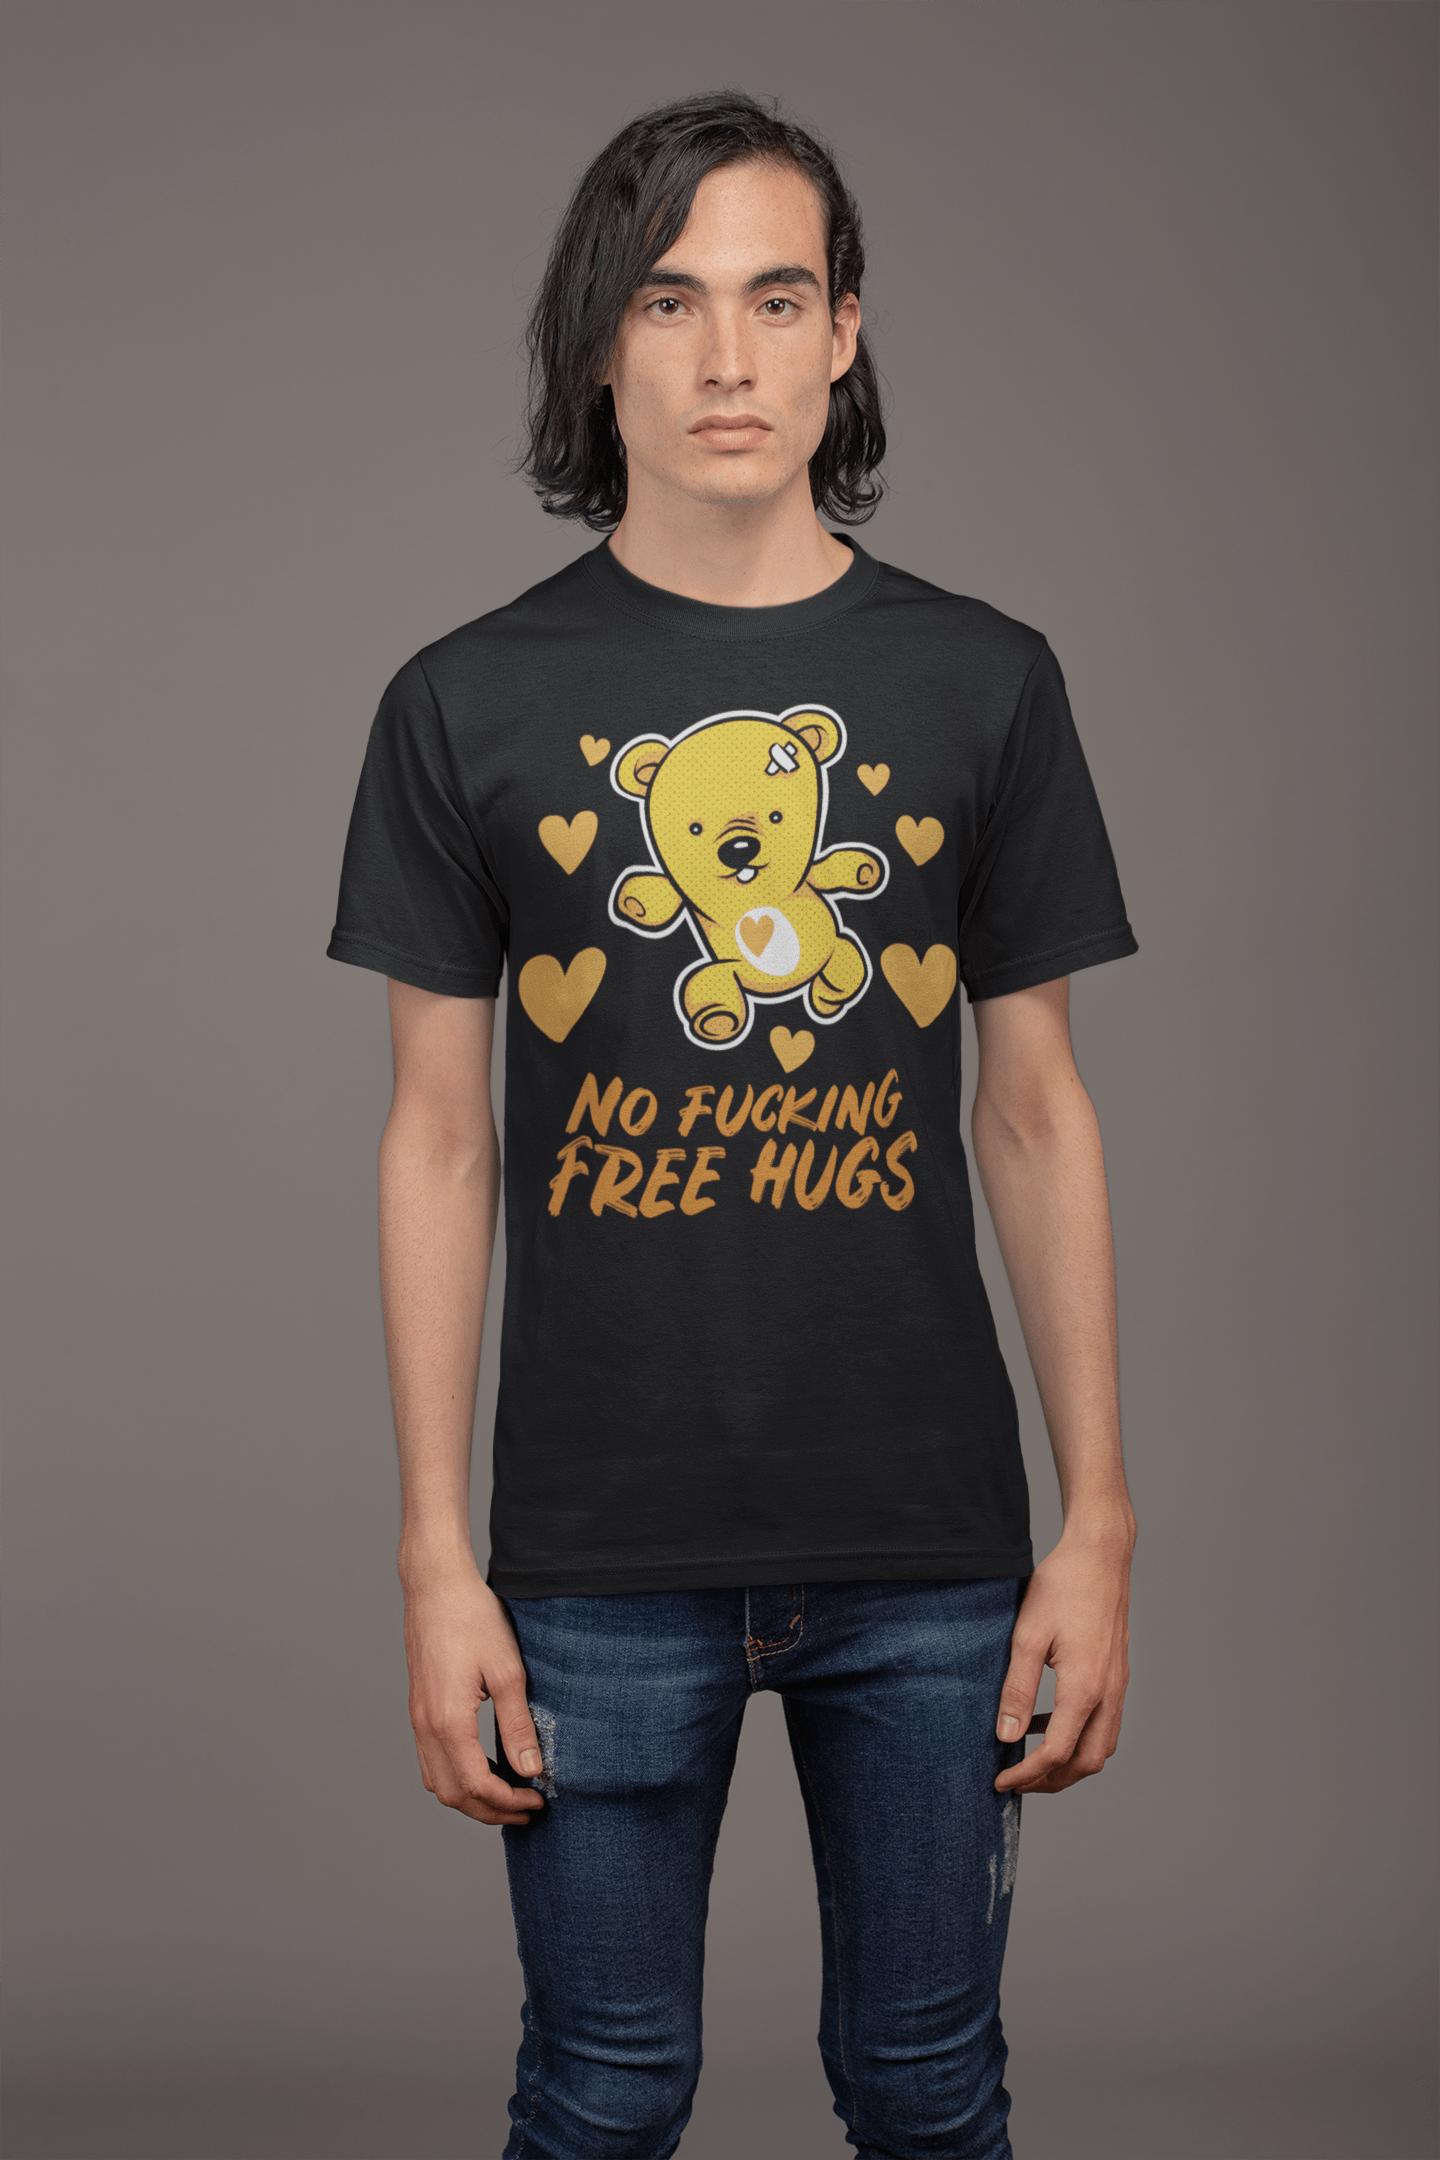 low priced e6392 ea06a Lustige T-Shirt für Männer - Free Hugs Sprüche Funshirt kaufen